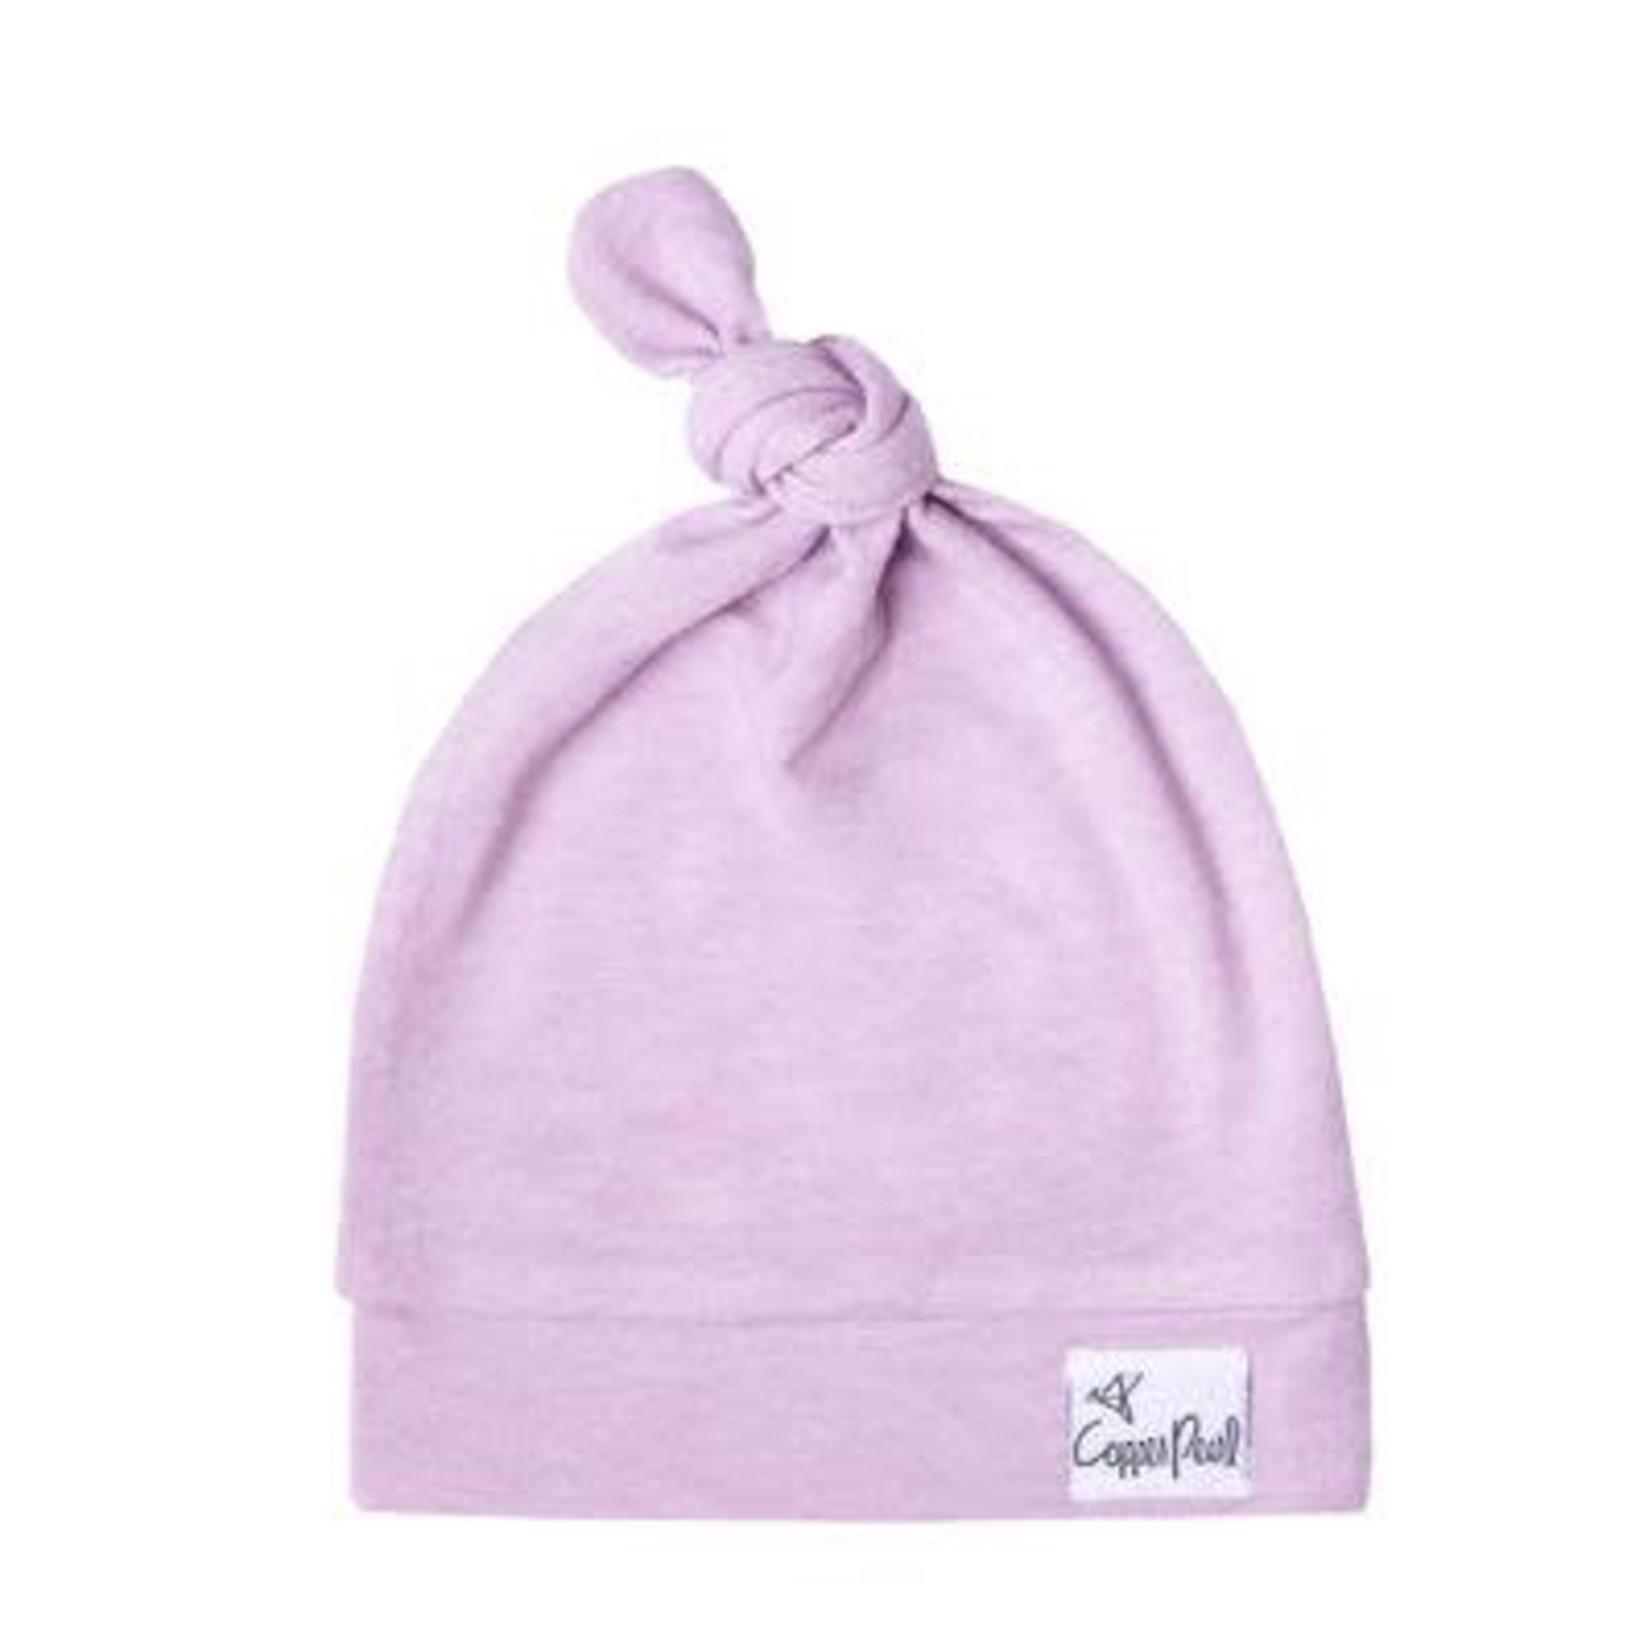 Copper Pearl Newborn Top Knot Hat, Lily x